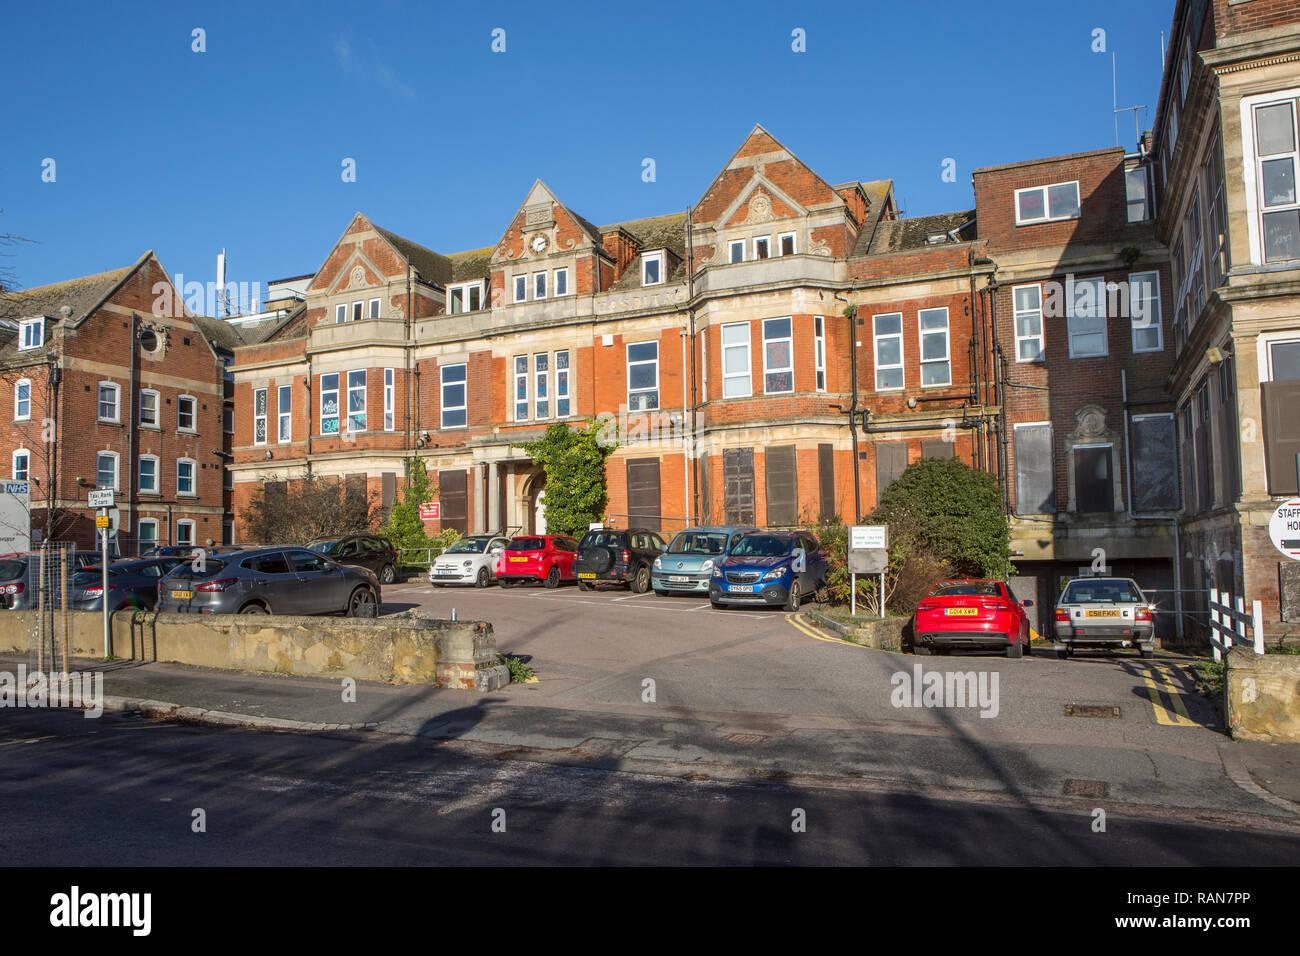 The old Royal Victoria Hospital, Folkestone, Kent, UK. - Stock Image